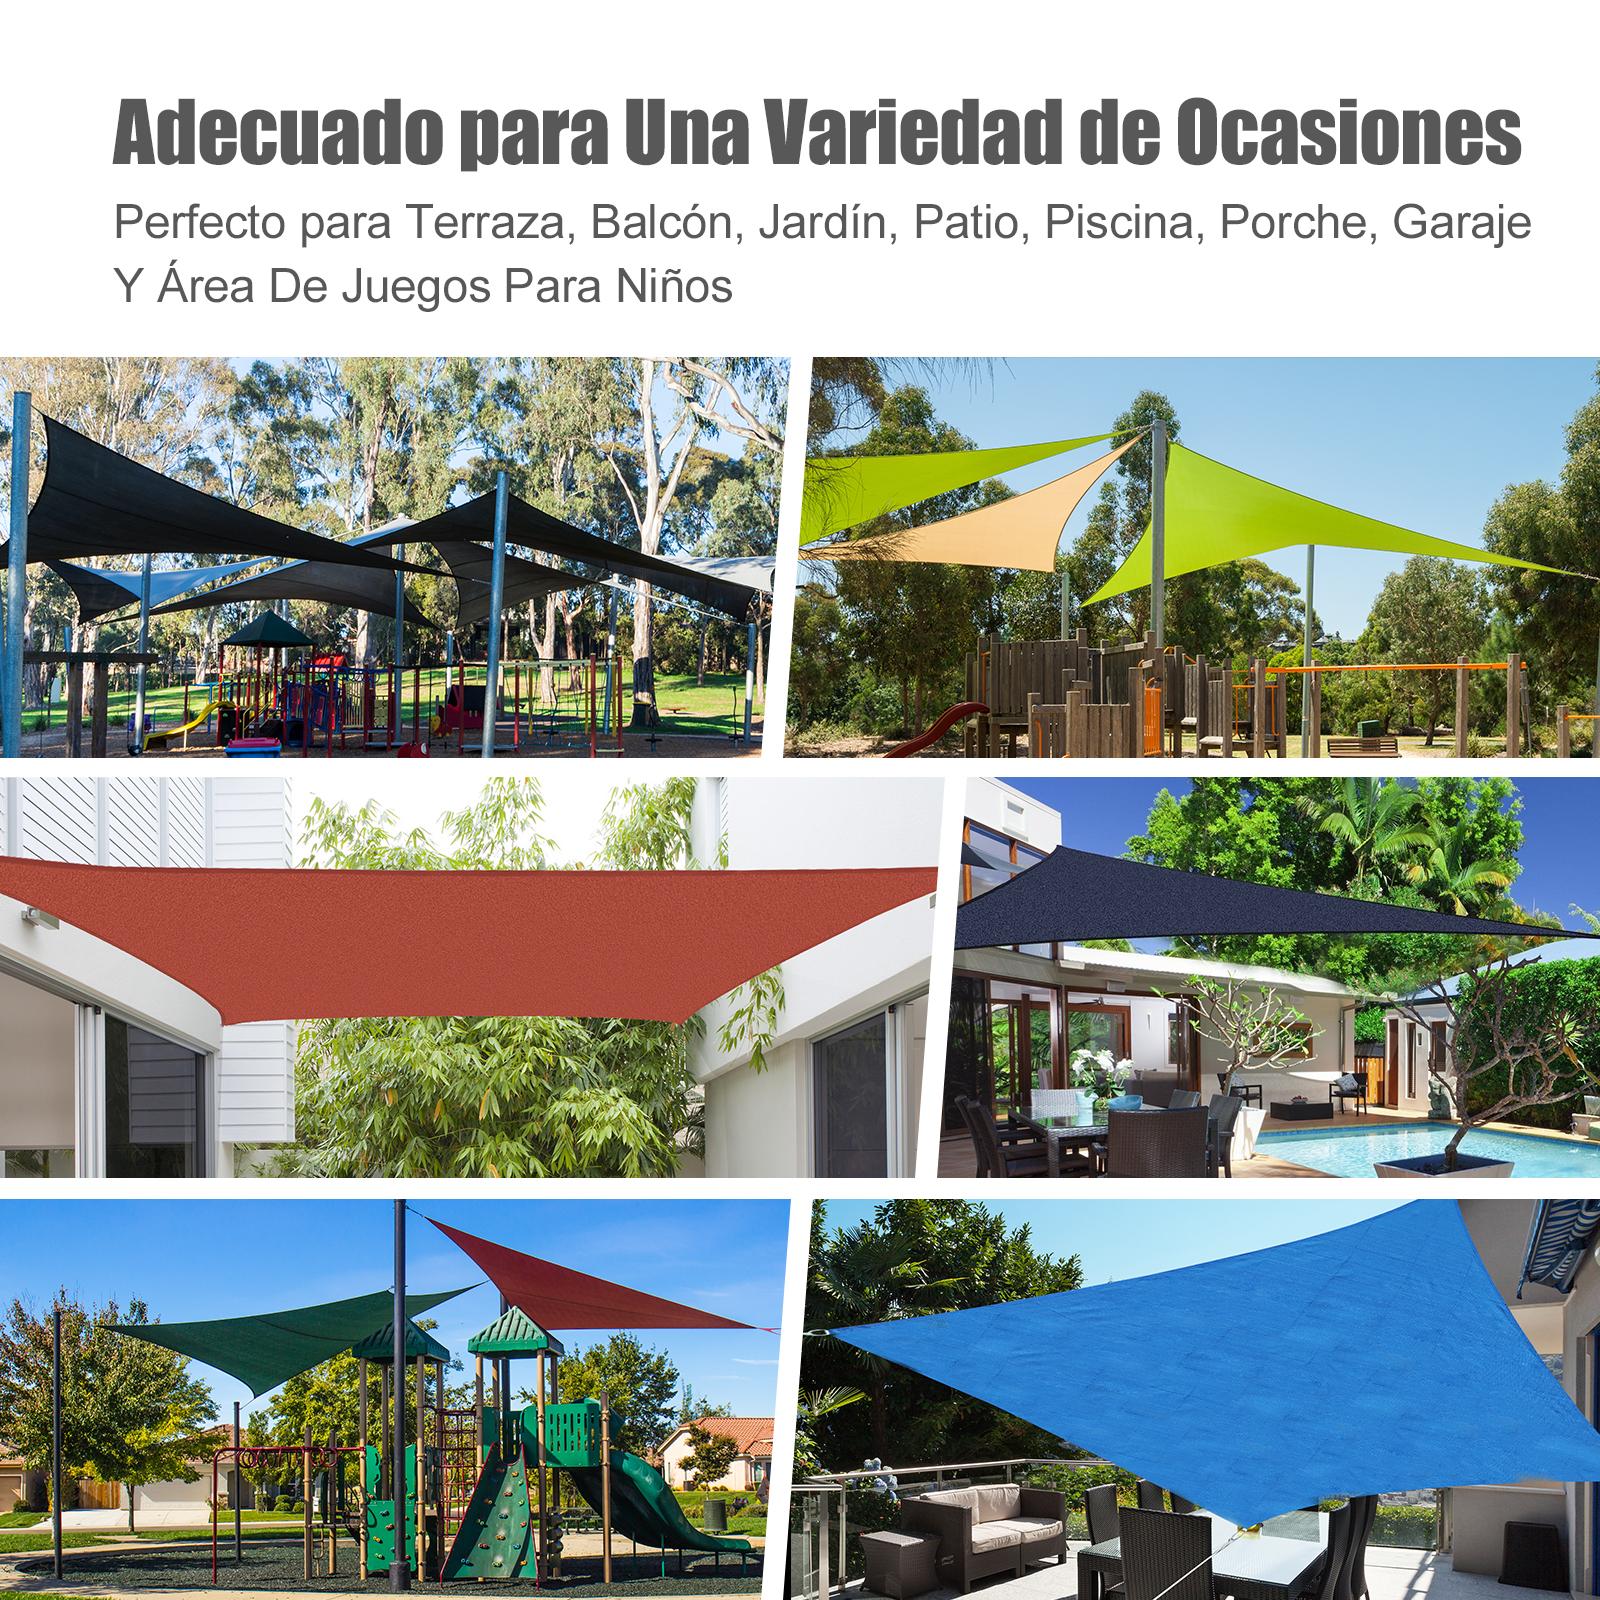 Toldo-Vela-Sombrilla-Parasol-Triangulo-Tejido-de-Poliester-185-g-m-Jardin-Playa miniatura 28